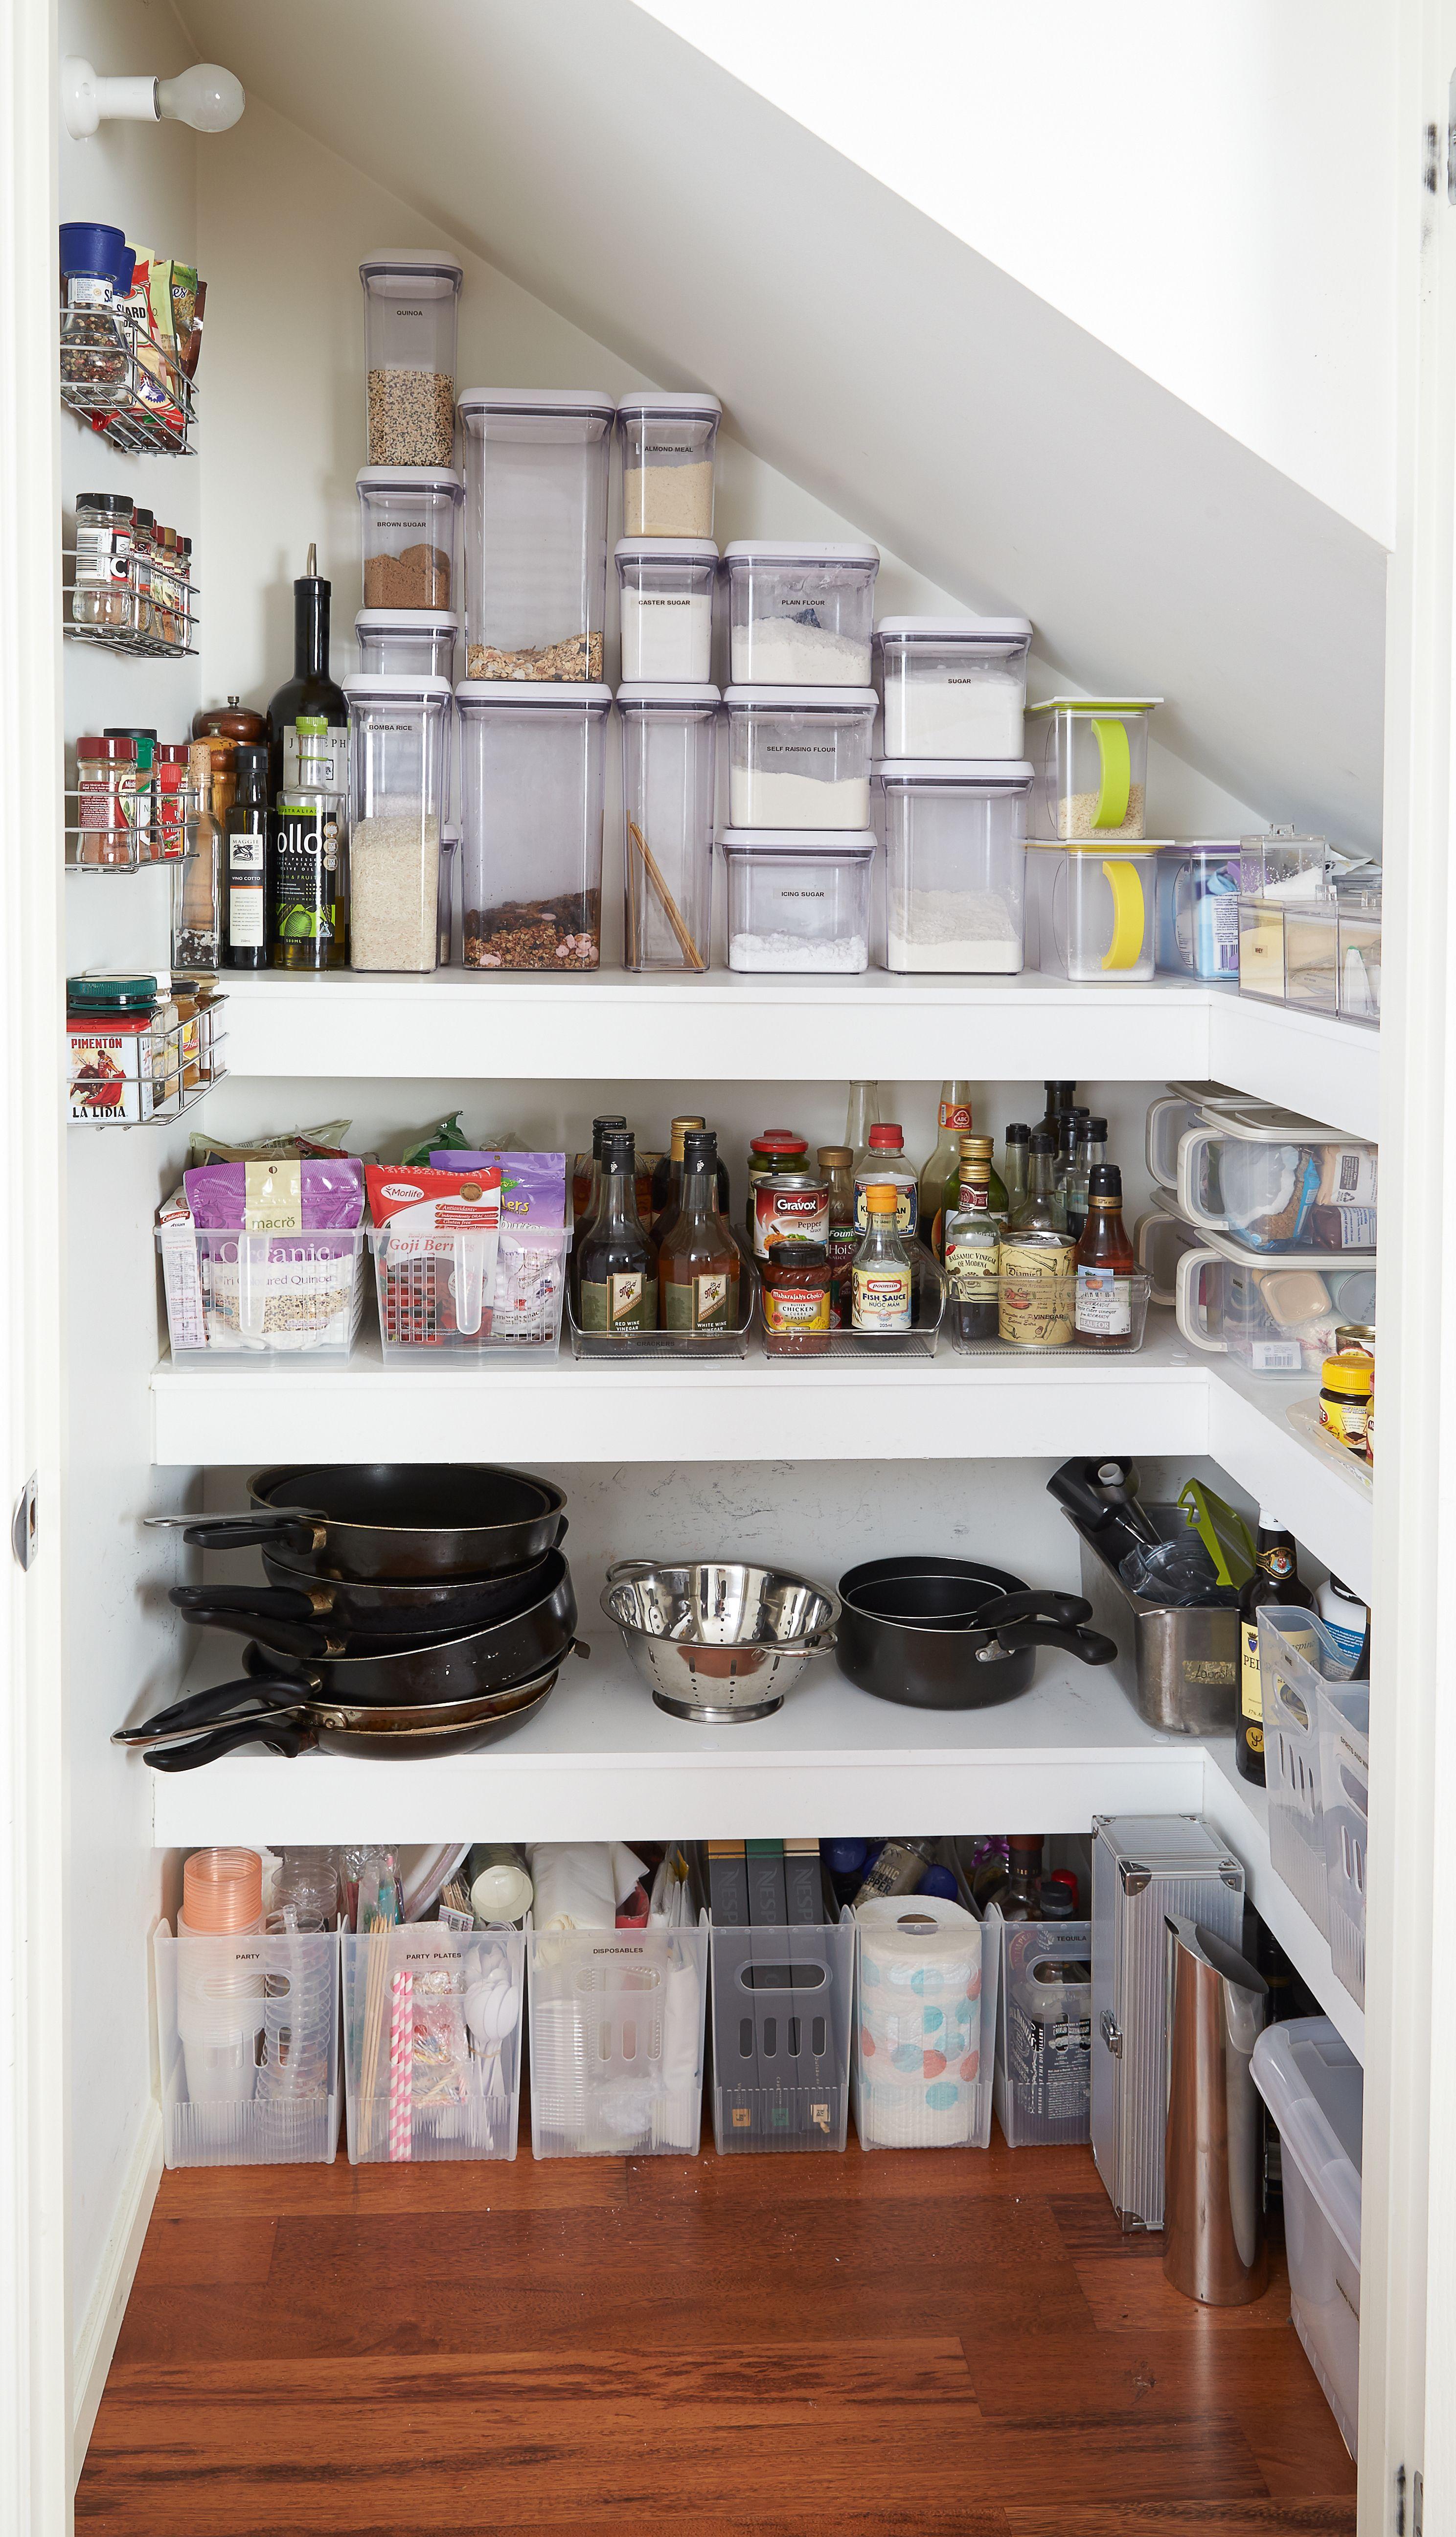 Ordenamos una despensa | Kitchen ideas | Pinterest | Despensa ...